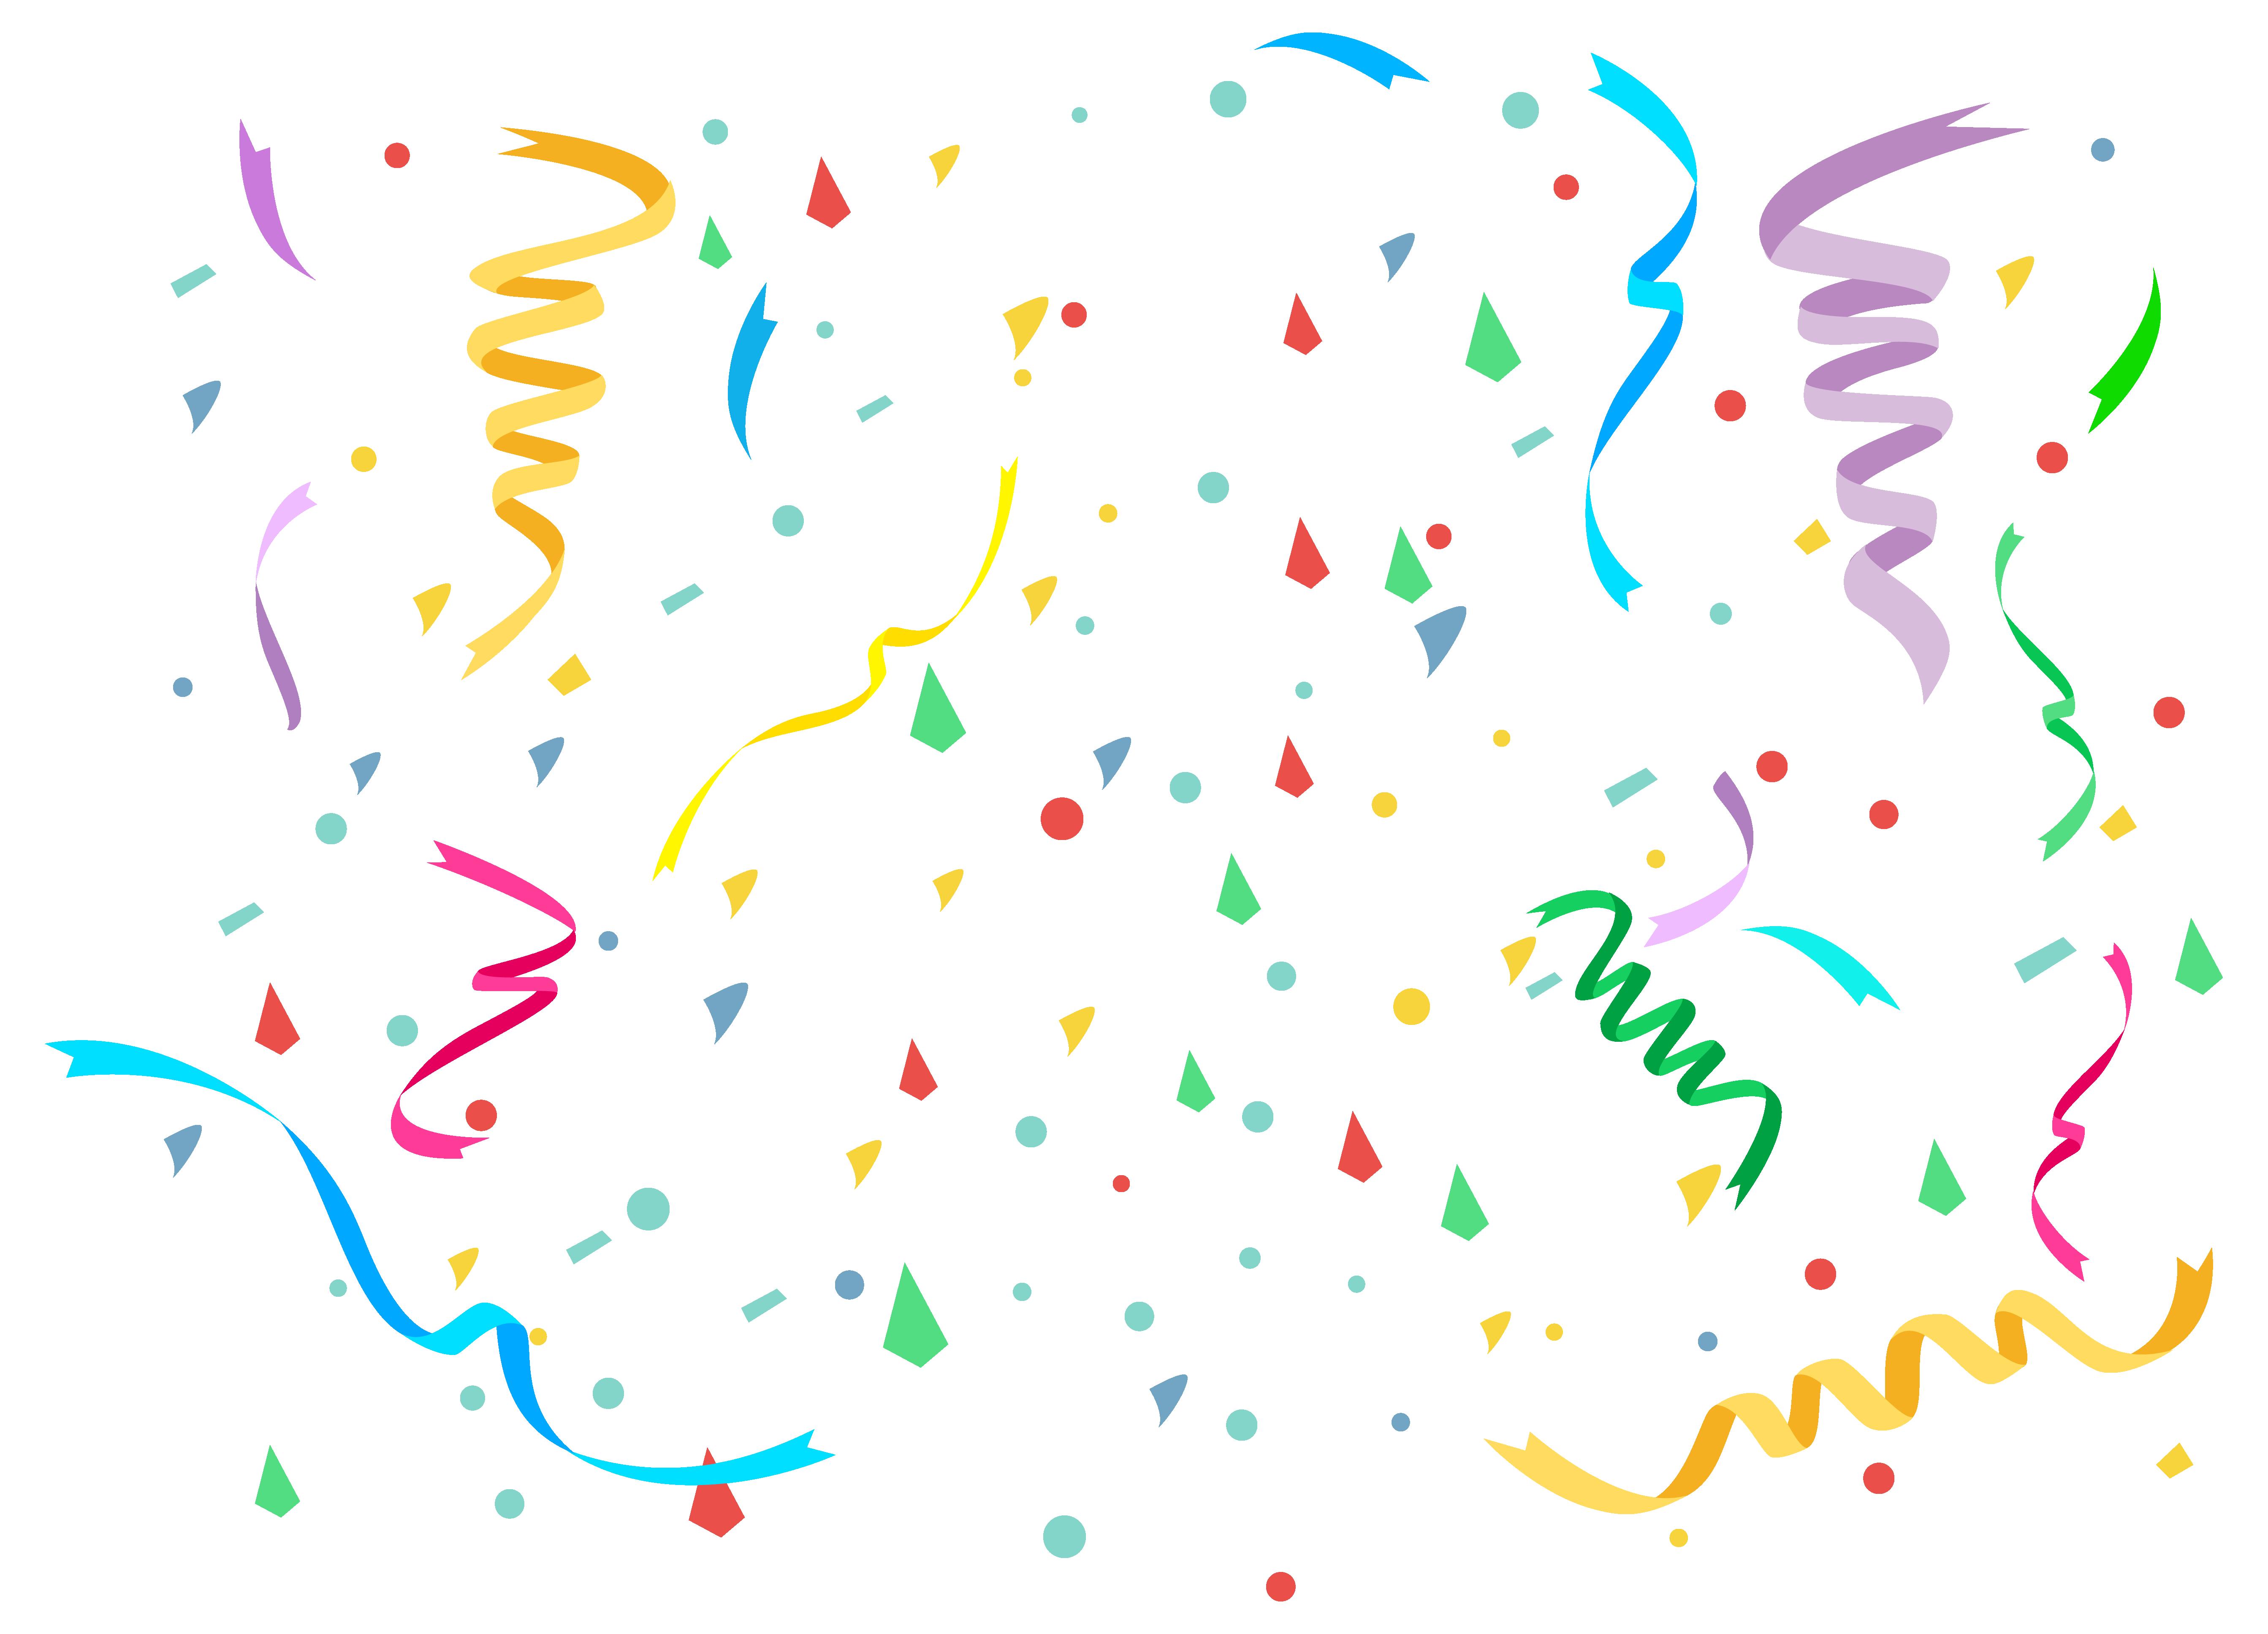 Confetti cake clipart image freeuse stock Birthday cake Clip art - Confetti PNG Clipart Image png download ... image freeuse stock